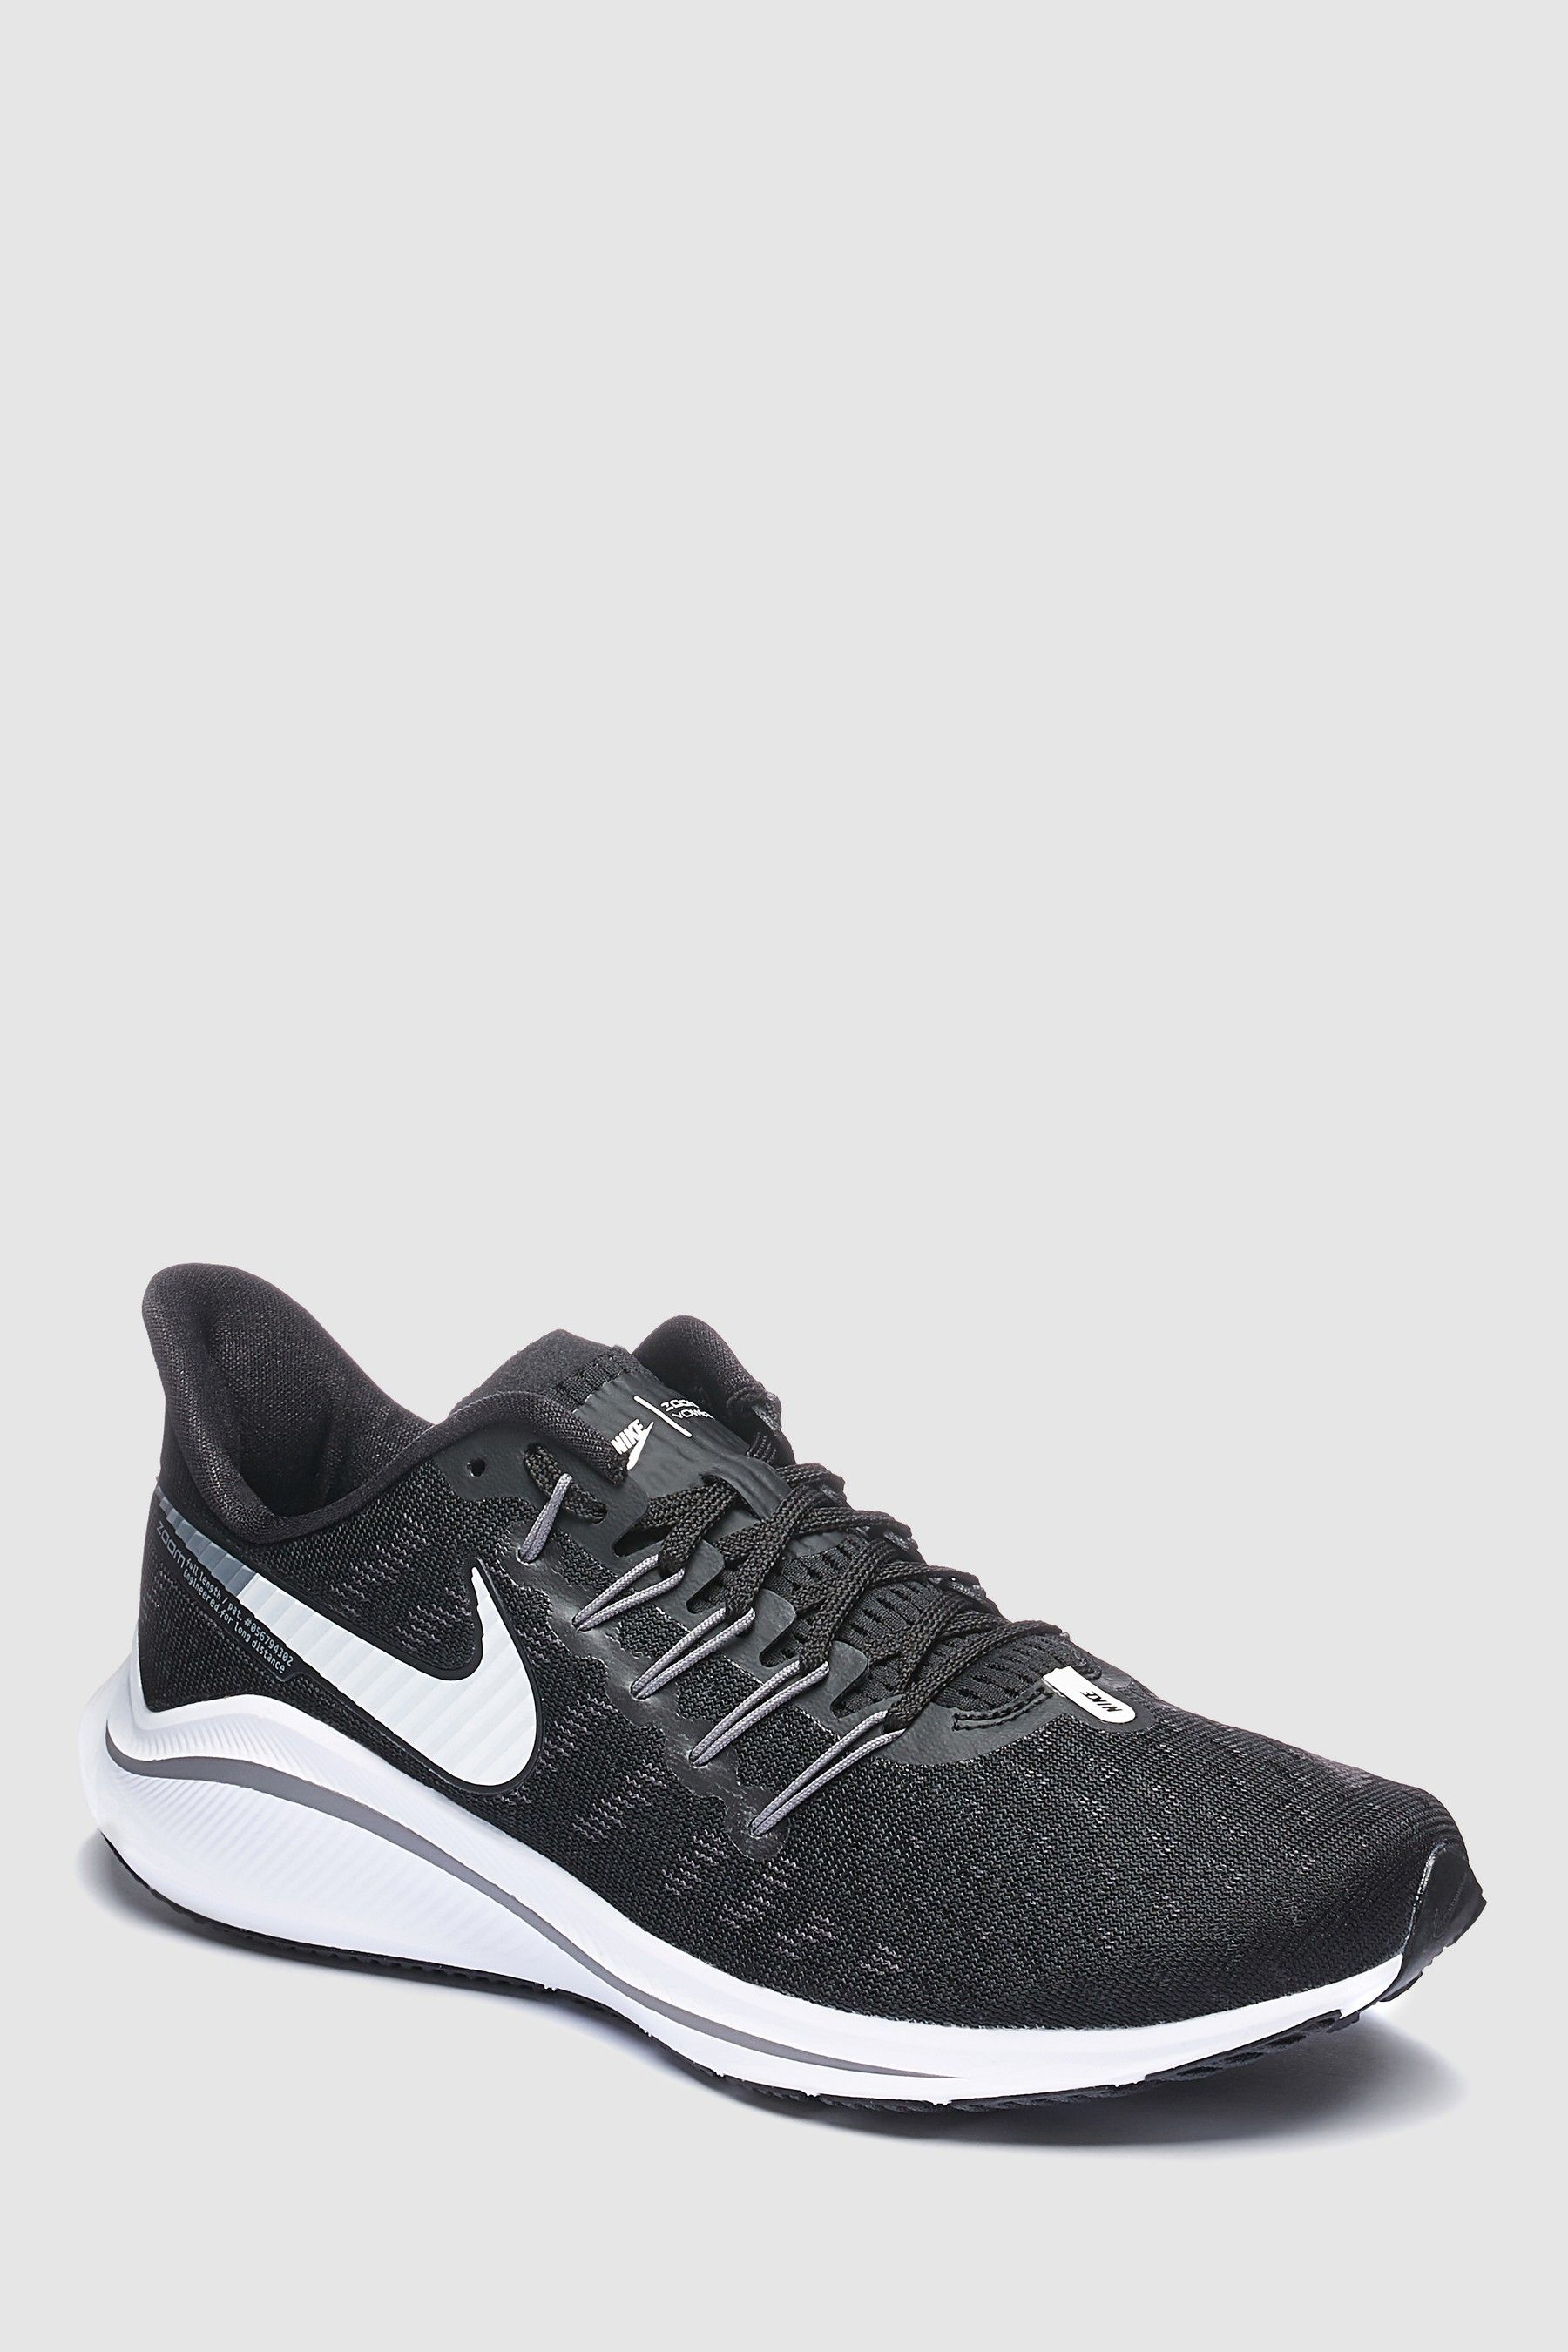 Nike Shop UK Online, Choose From Various Types Nike At Great